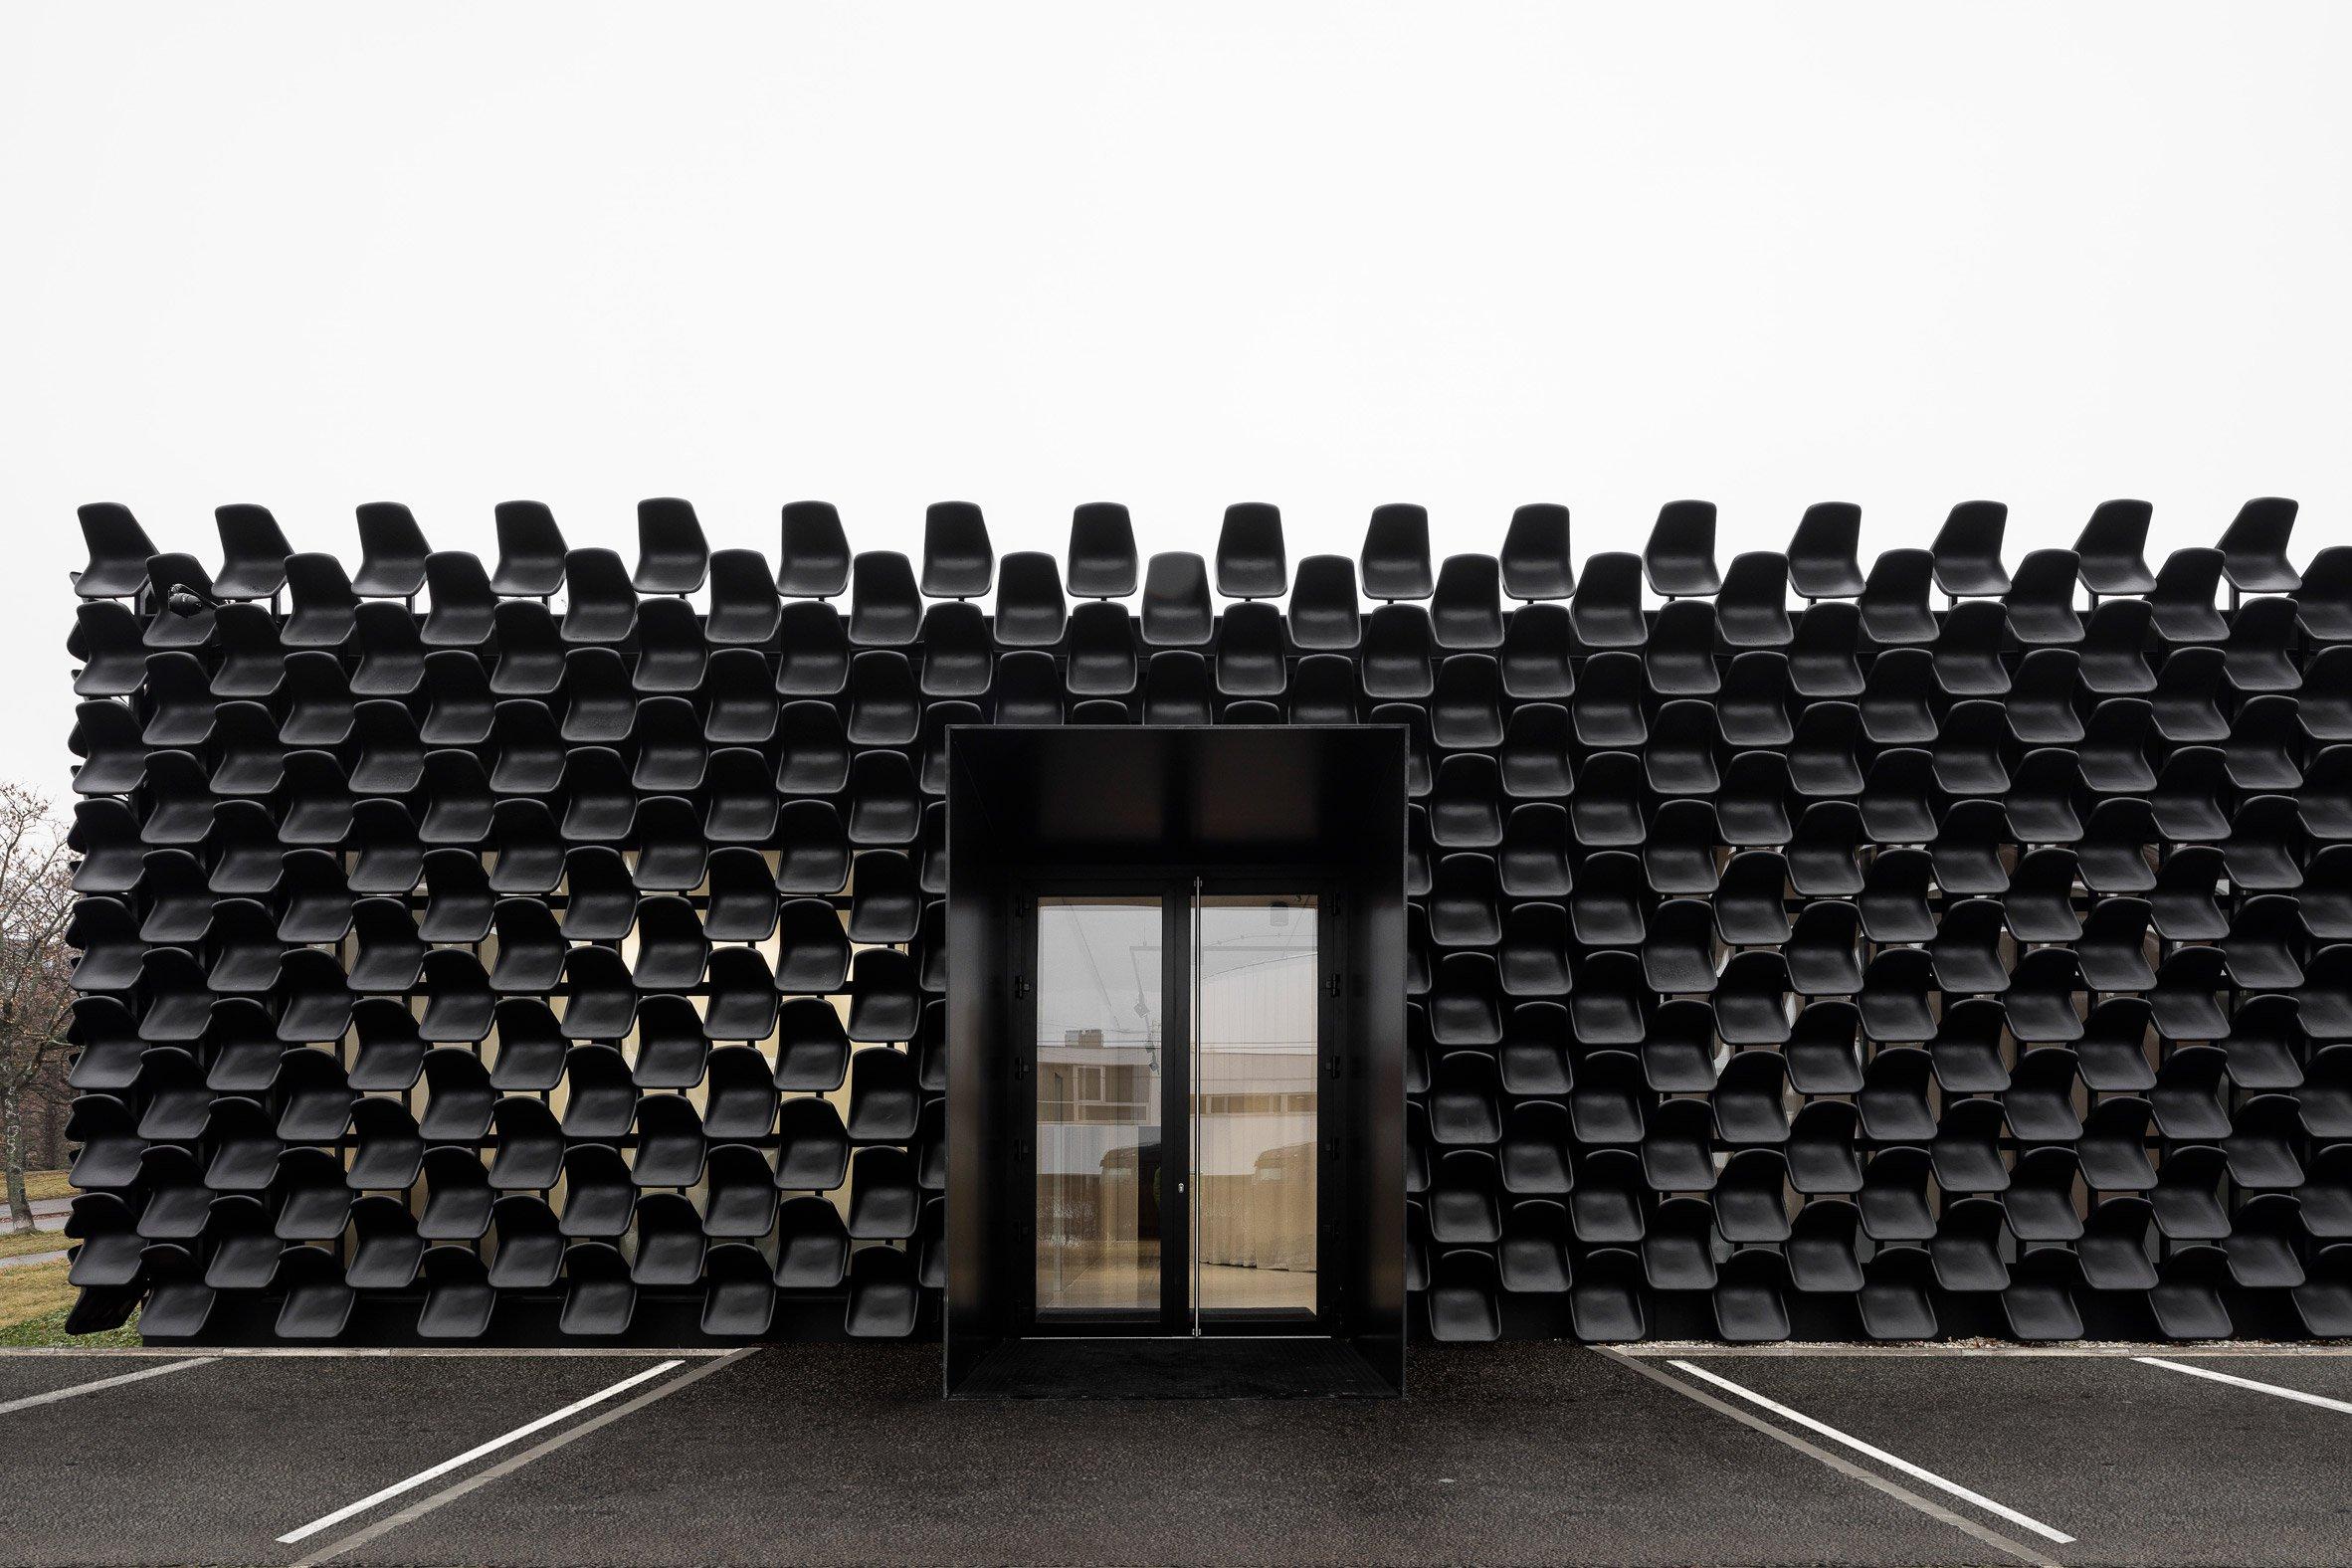 gallery-furniture-chybik-kistof-architecture-retail-czech-republic_dezeen_2364_col_1.jpg